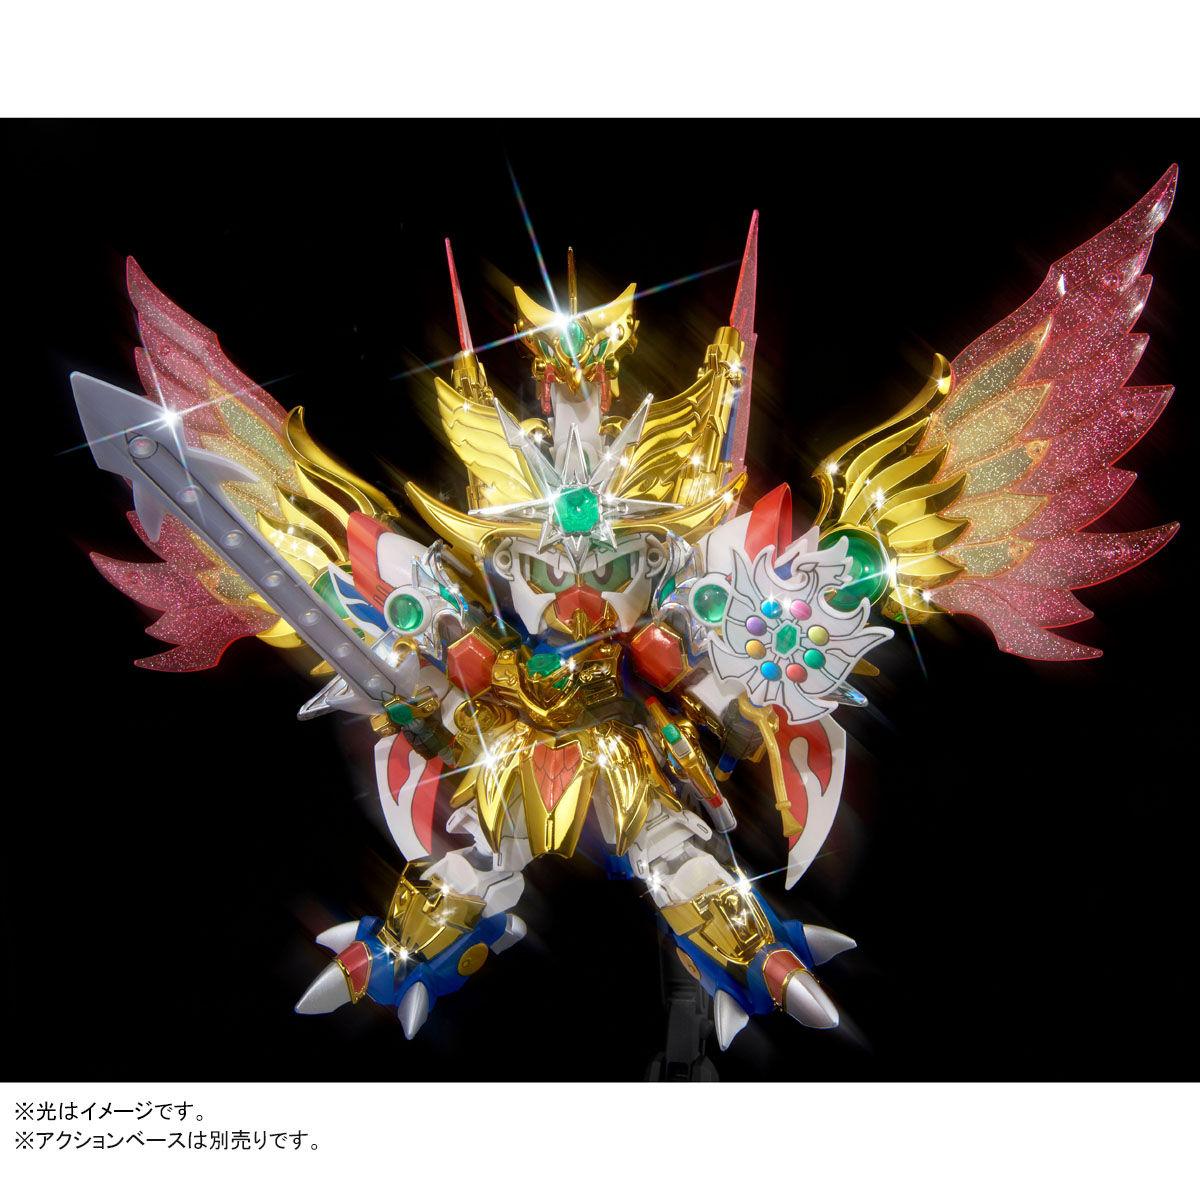 BB戦士 LEGENDBB 飛駆鳥大将軍(ビクトリーだいしょうぐん) プラモデル